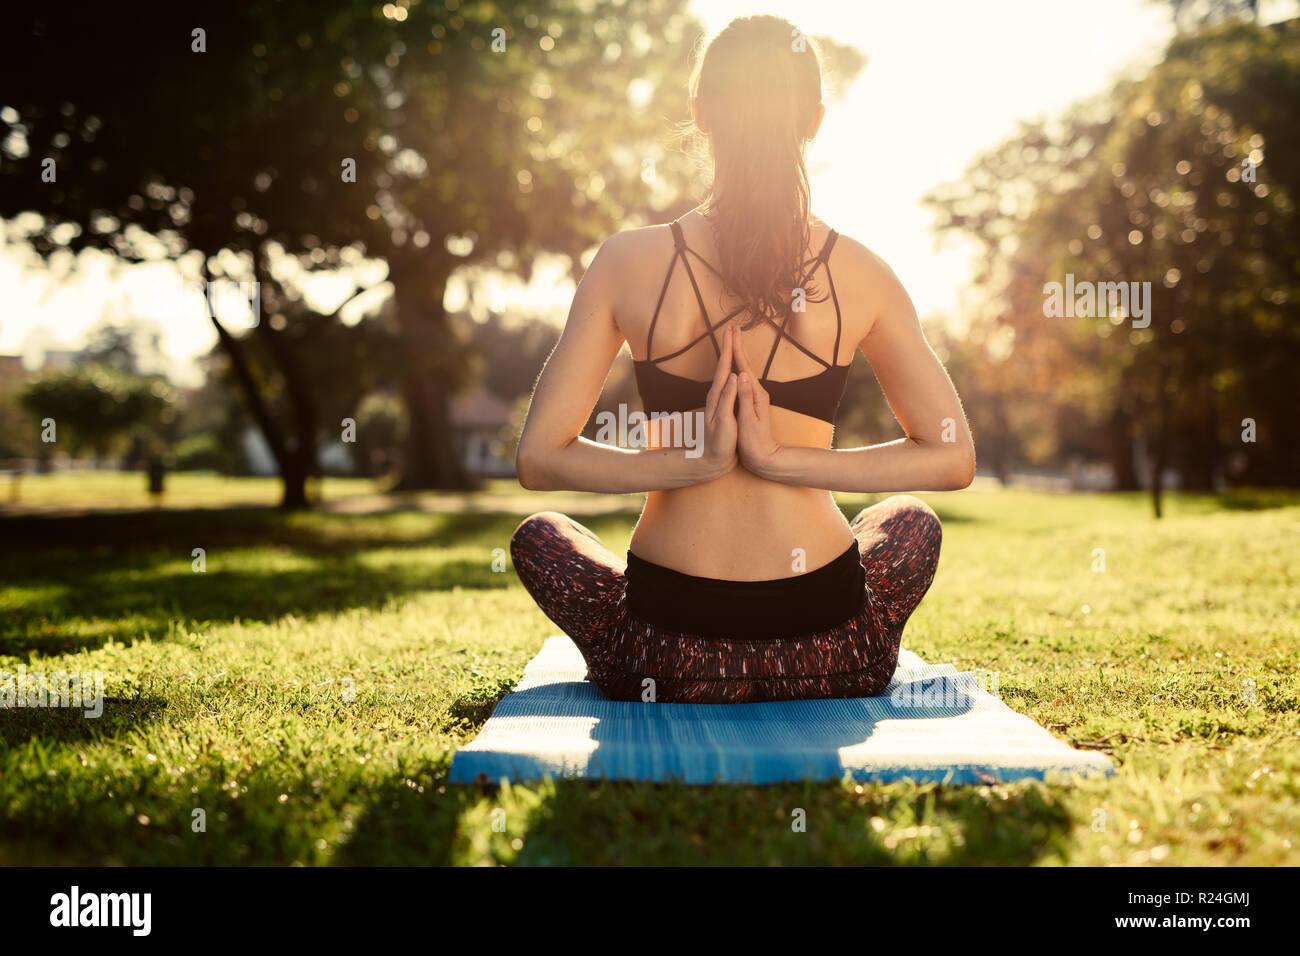 Woman doing yoga at park, reverse prayer position. Fitness woman doing Pashchima Namaskarasana yoga sitting on mat at the park. Rear view shot of fema - Stock Image